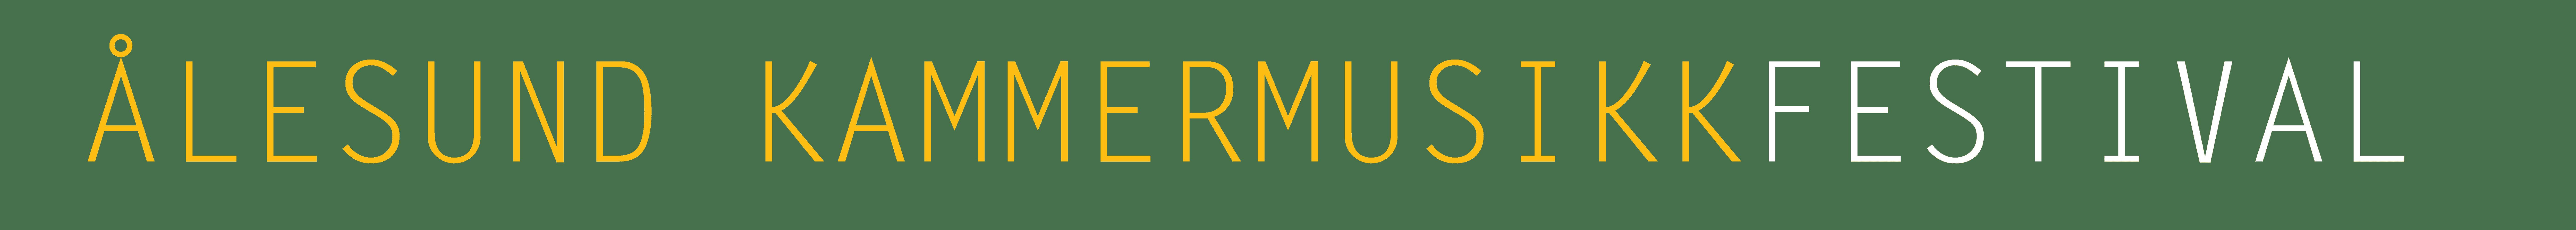 Ålesund kammermusikkfestival